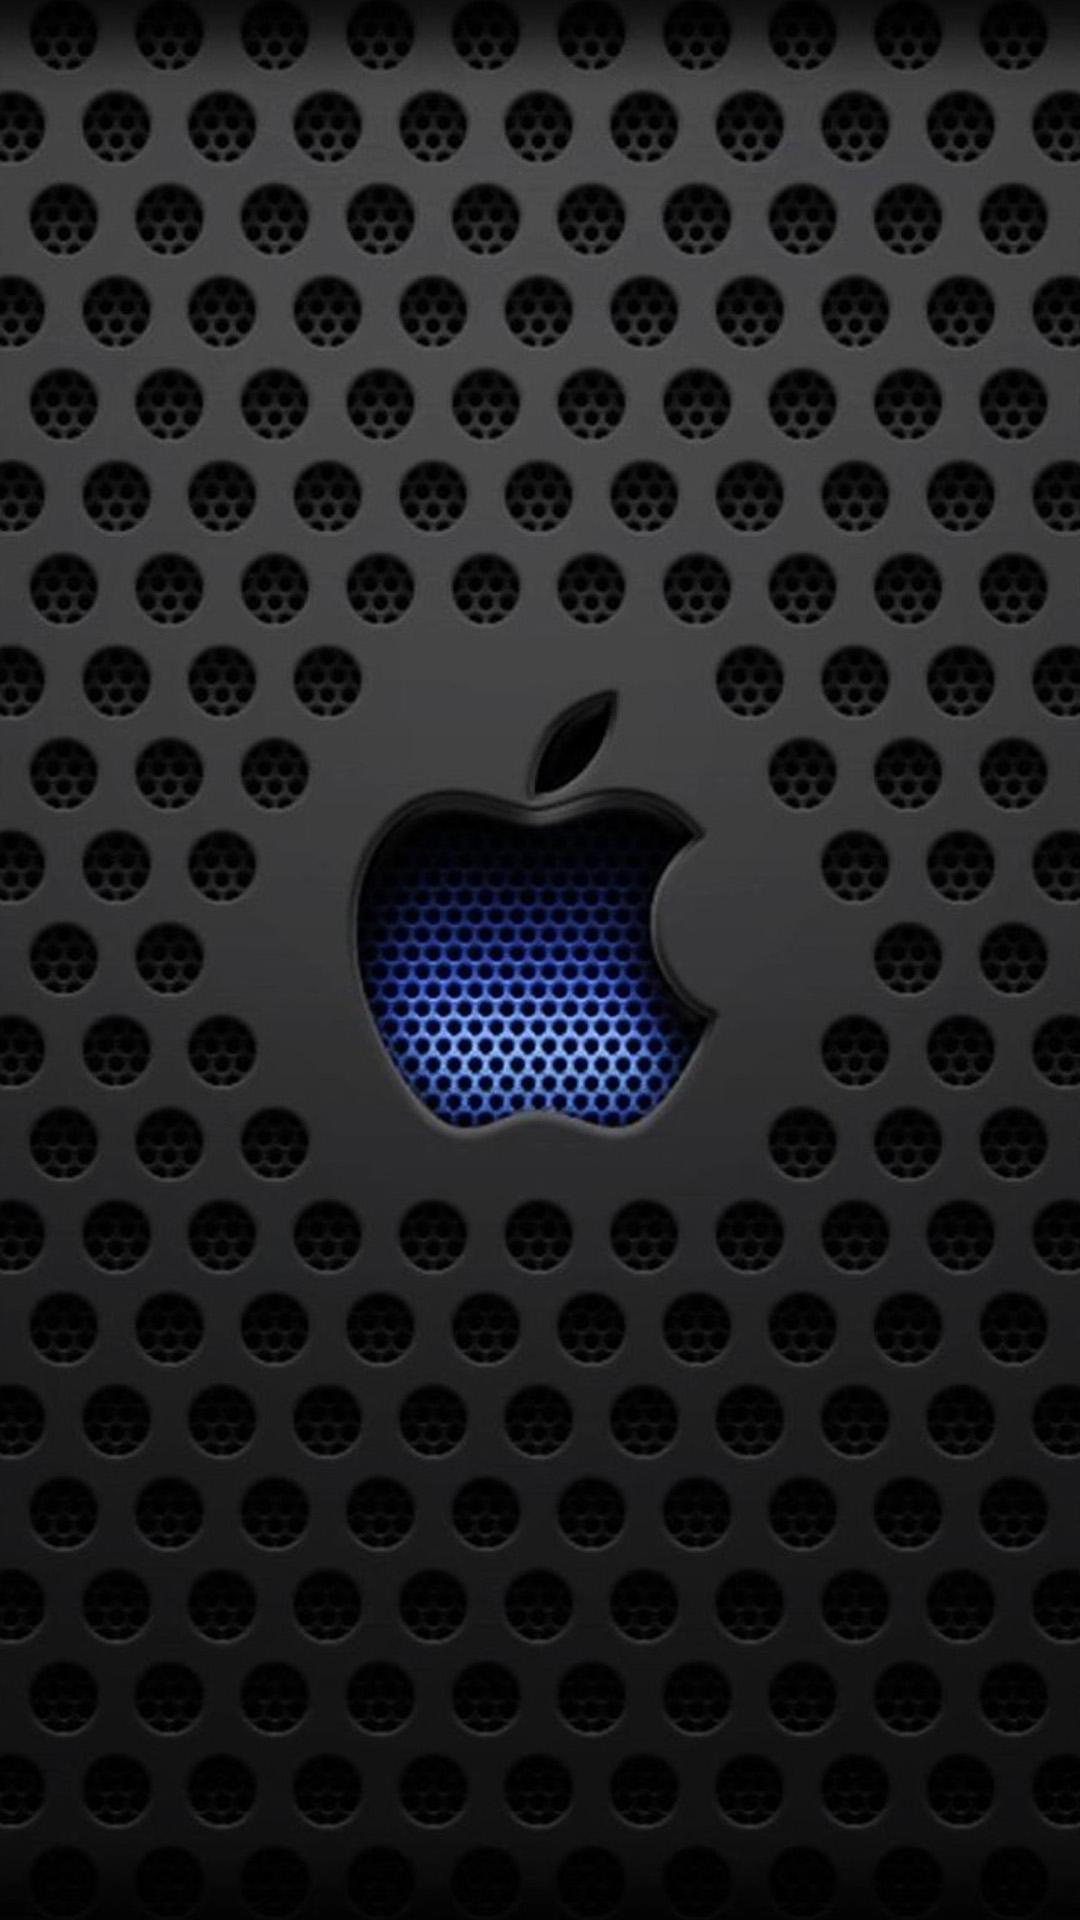 48 ] Apple IPhone 6 Wallpaper On WallpaperSafari